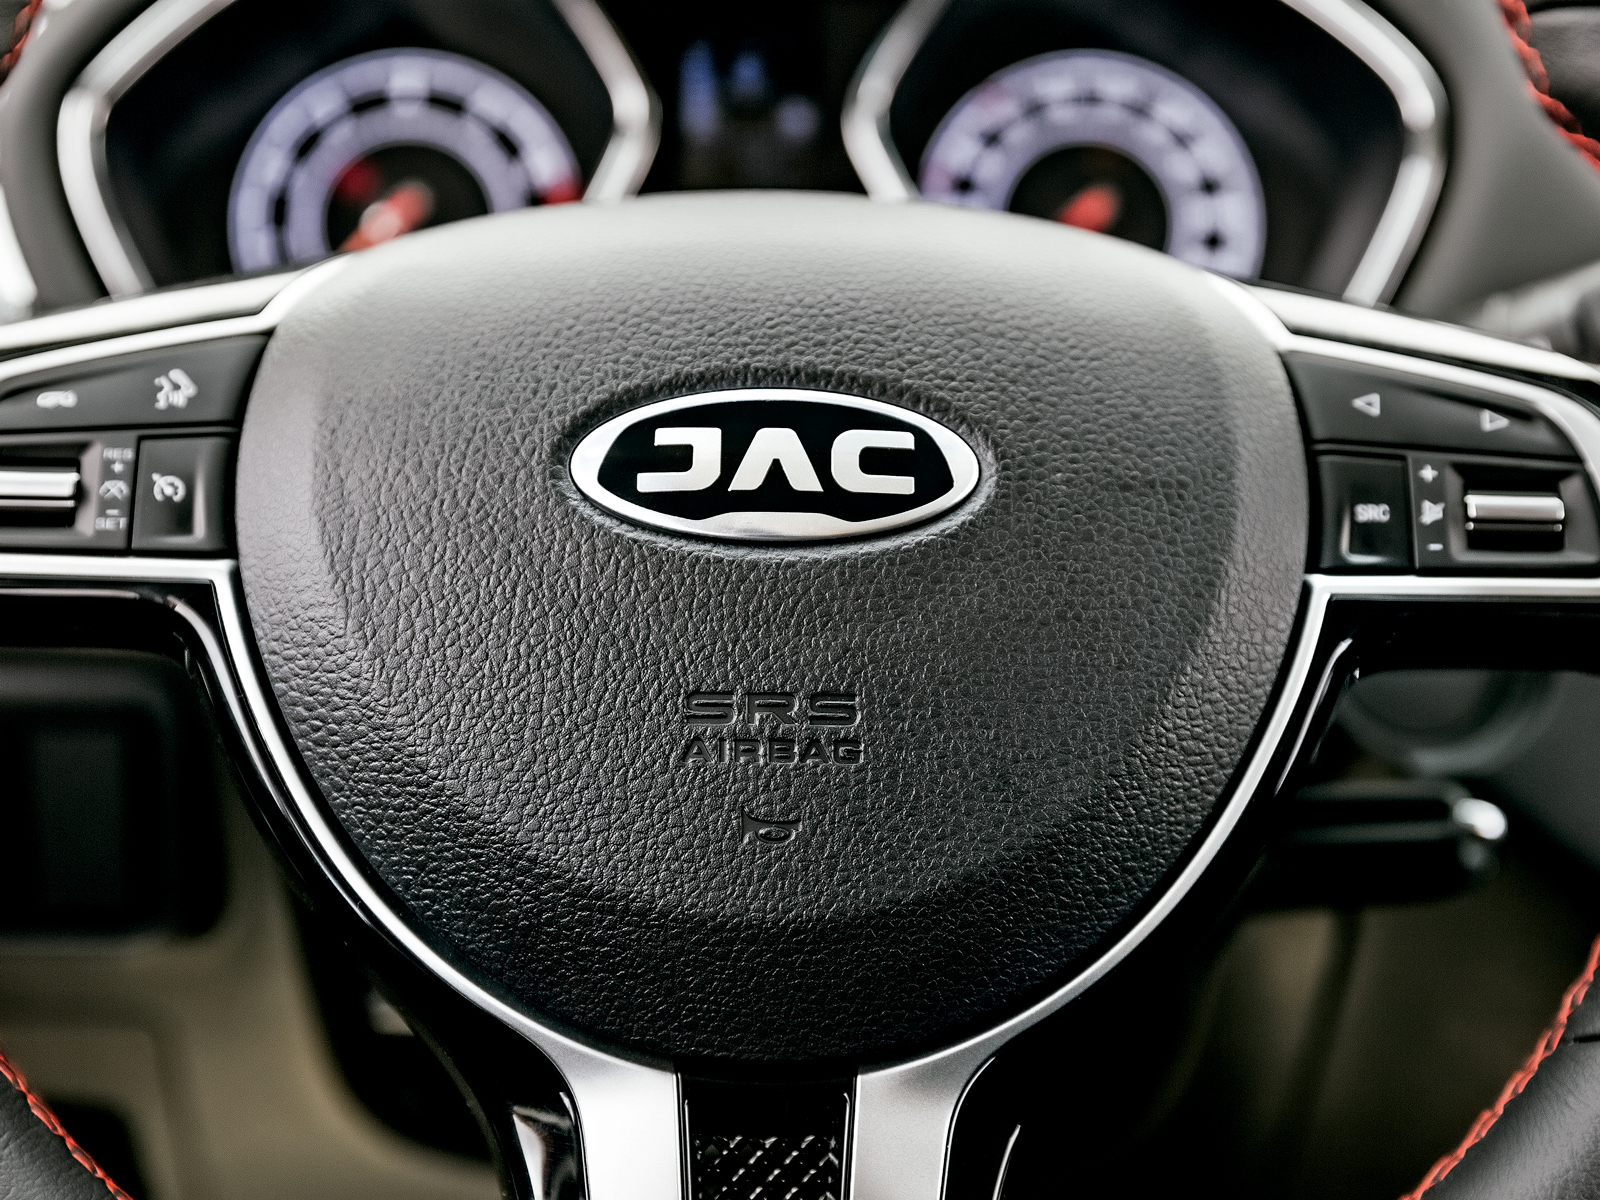 O volante ostenta o novo logotipo da JAC